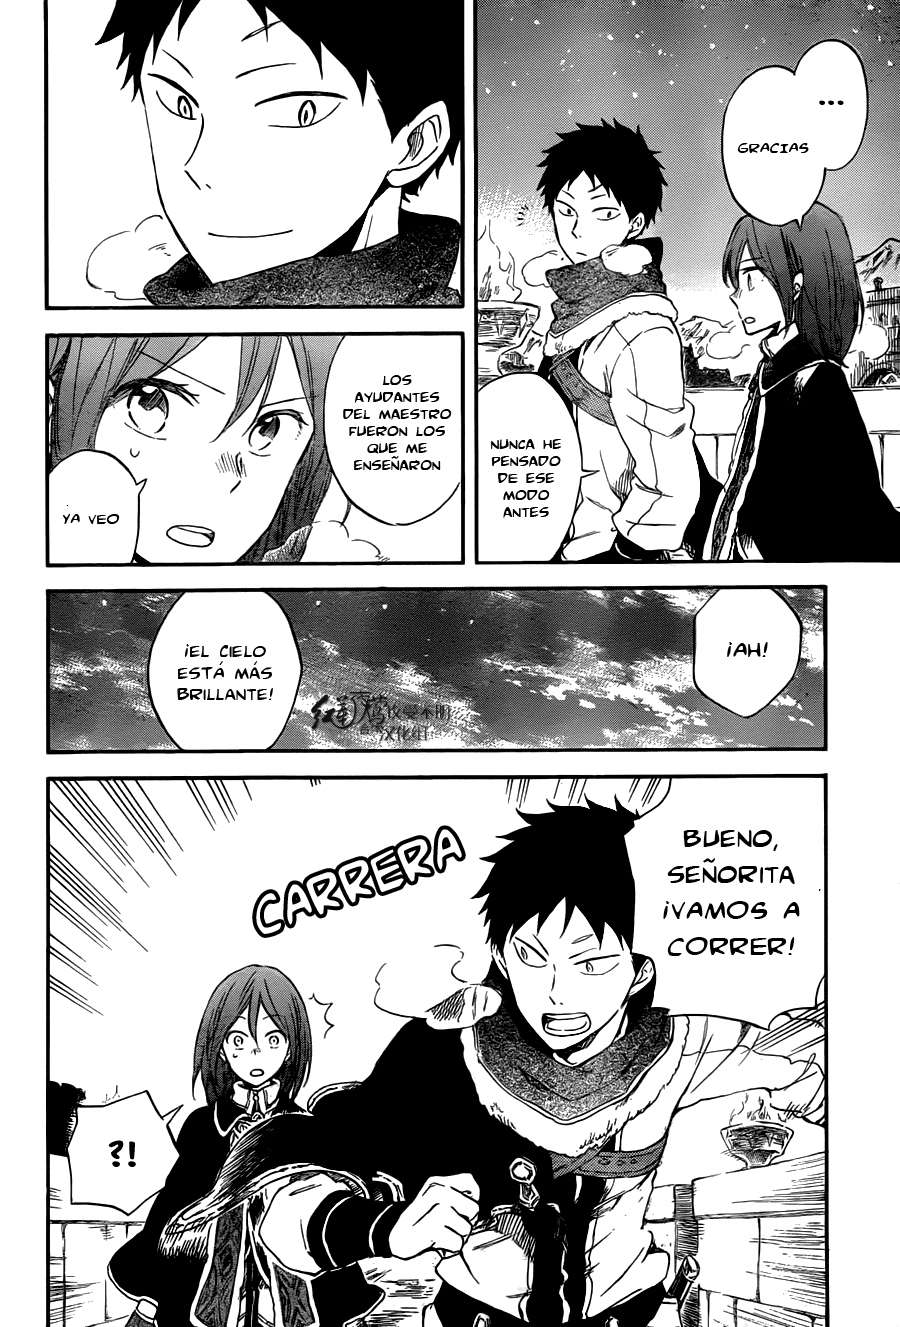 https://c5.ninemanga.com/es_manga/12/16588/399294/2303f734398930d411e73759f3b33211.jpg Page 5